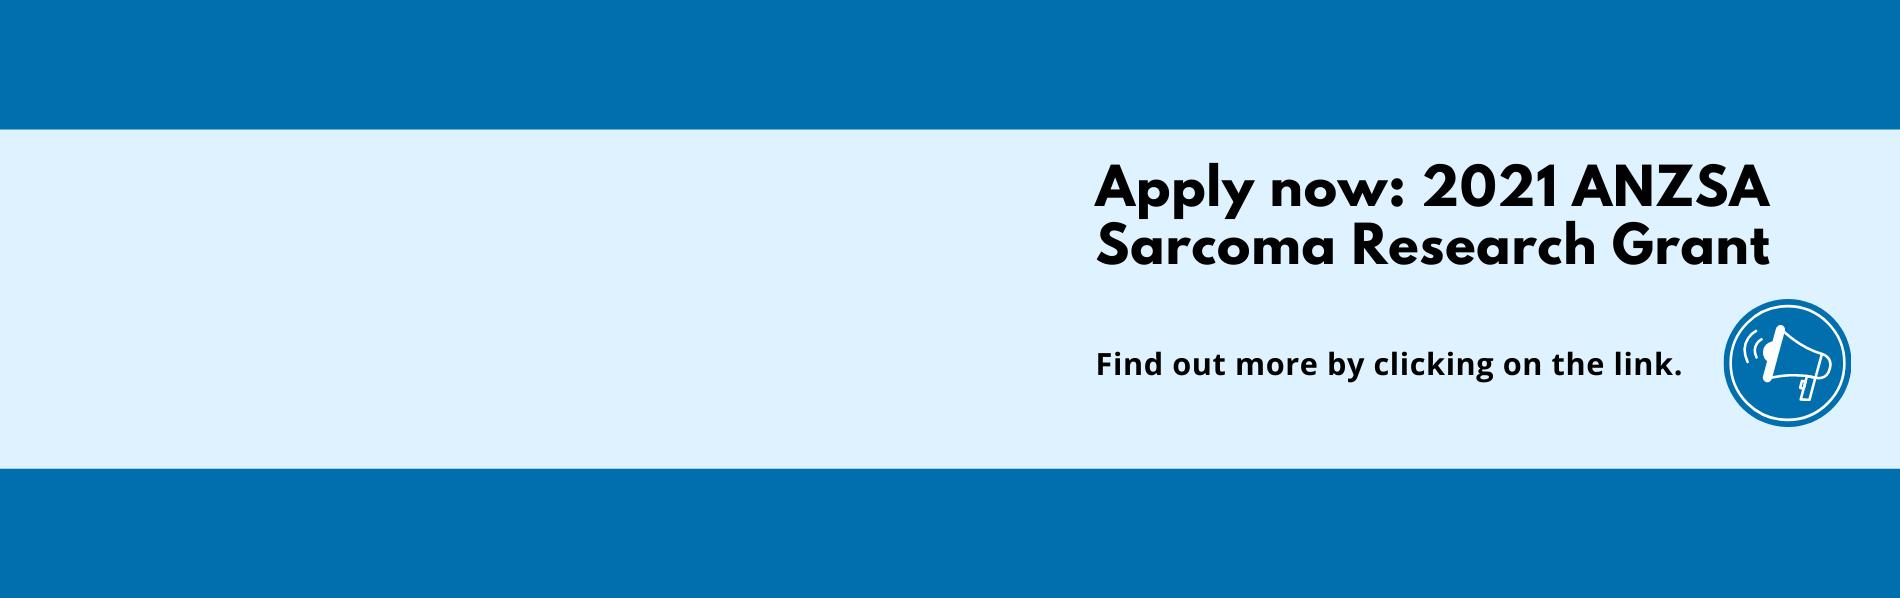 Apply - 2021 ANZSA Sarcoma Research Grant